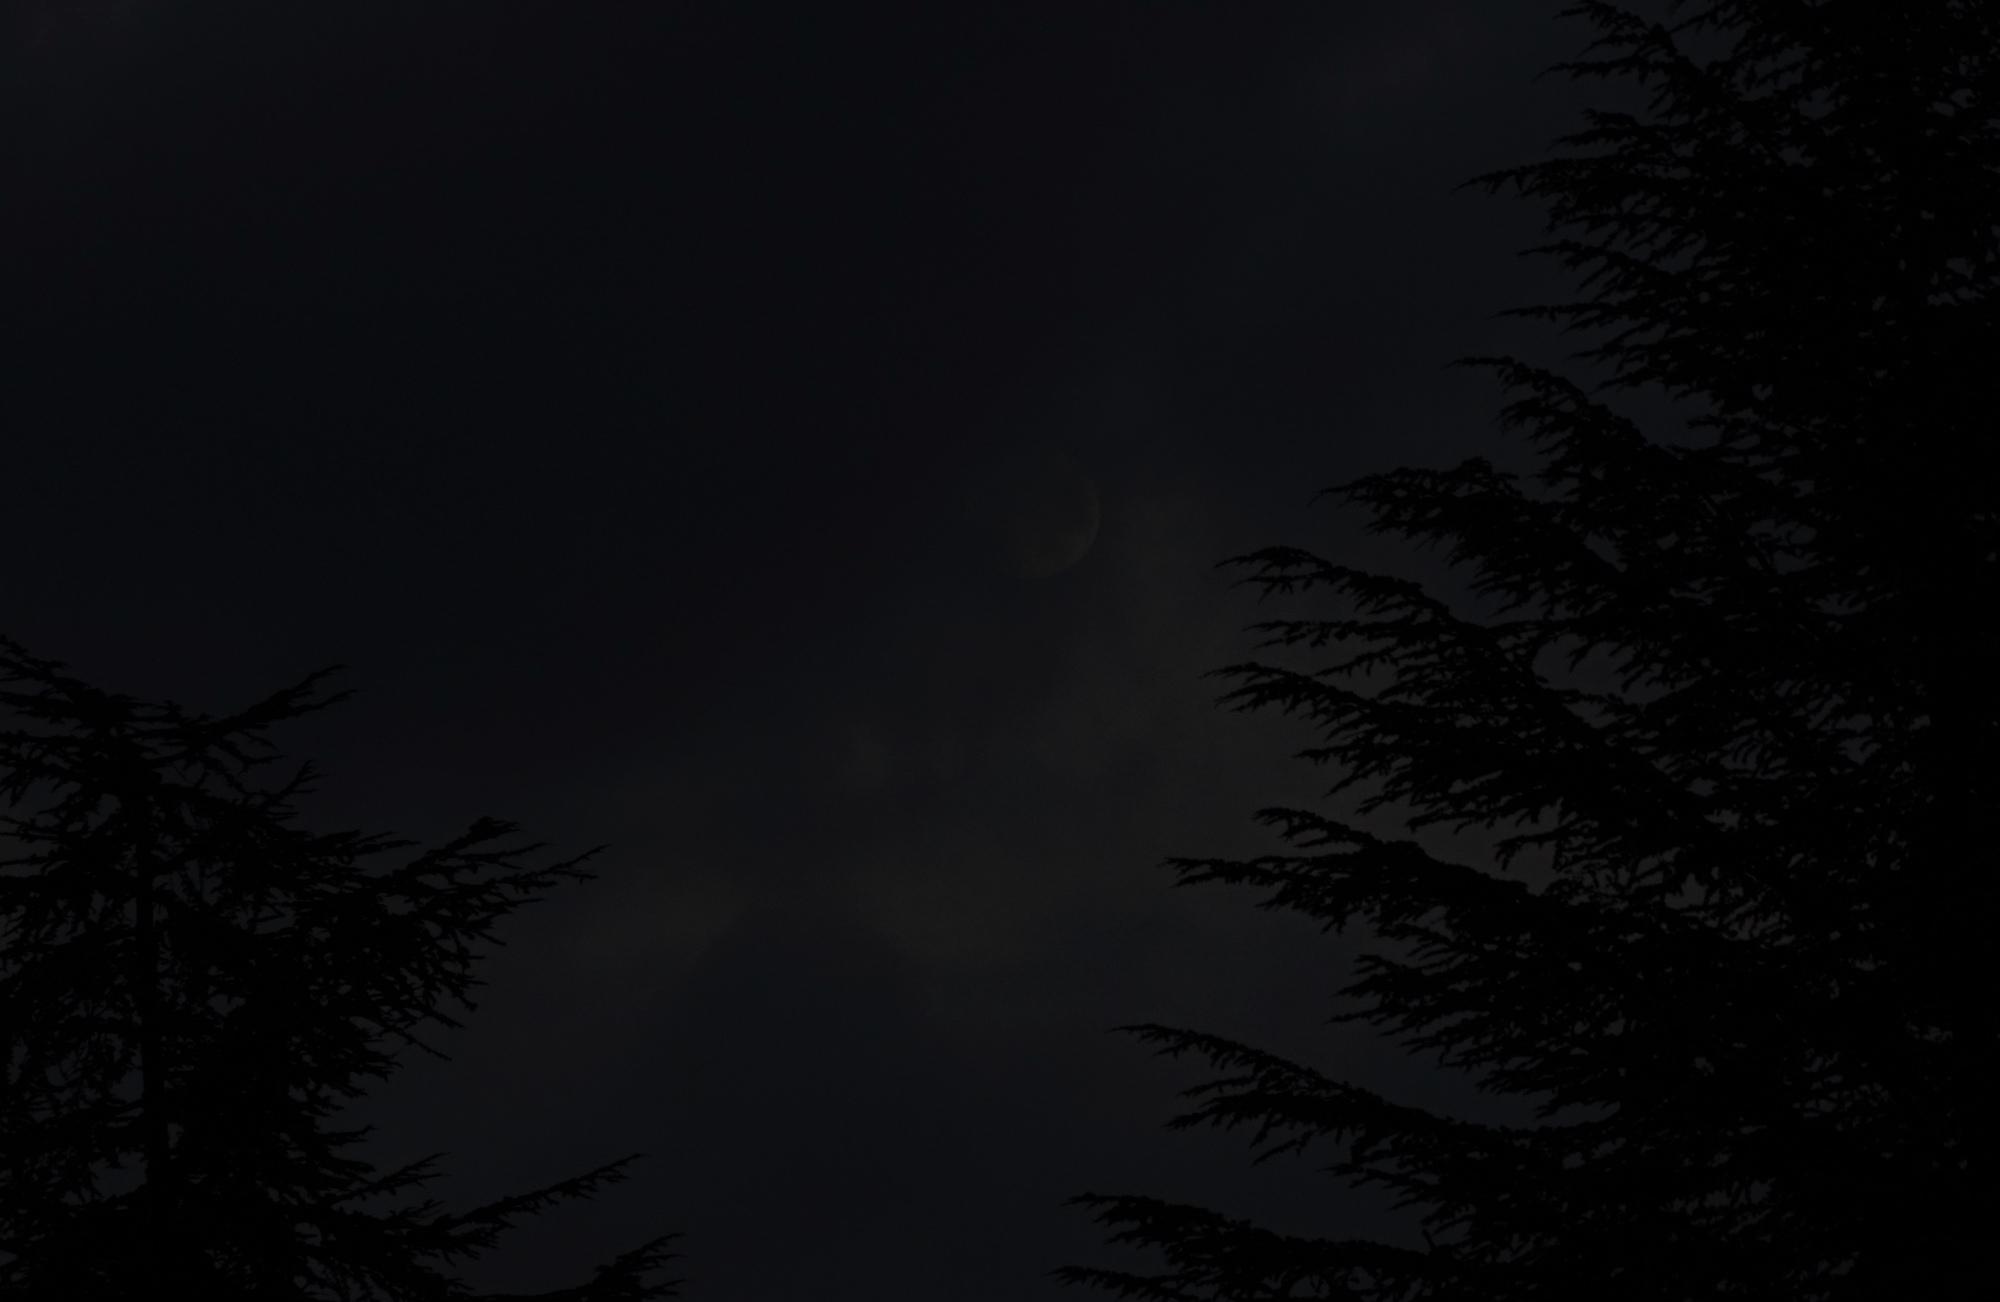 DSC04723.jpg2.thumb.jpg.8cb32ddce86daf96c35c9921e34c2703.jpg